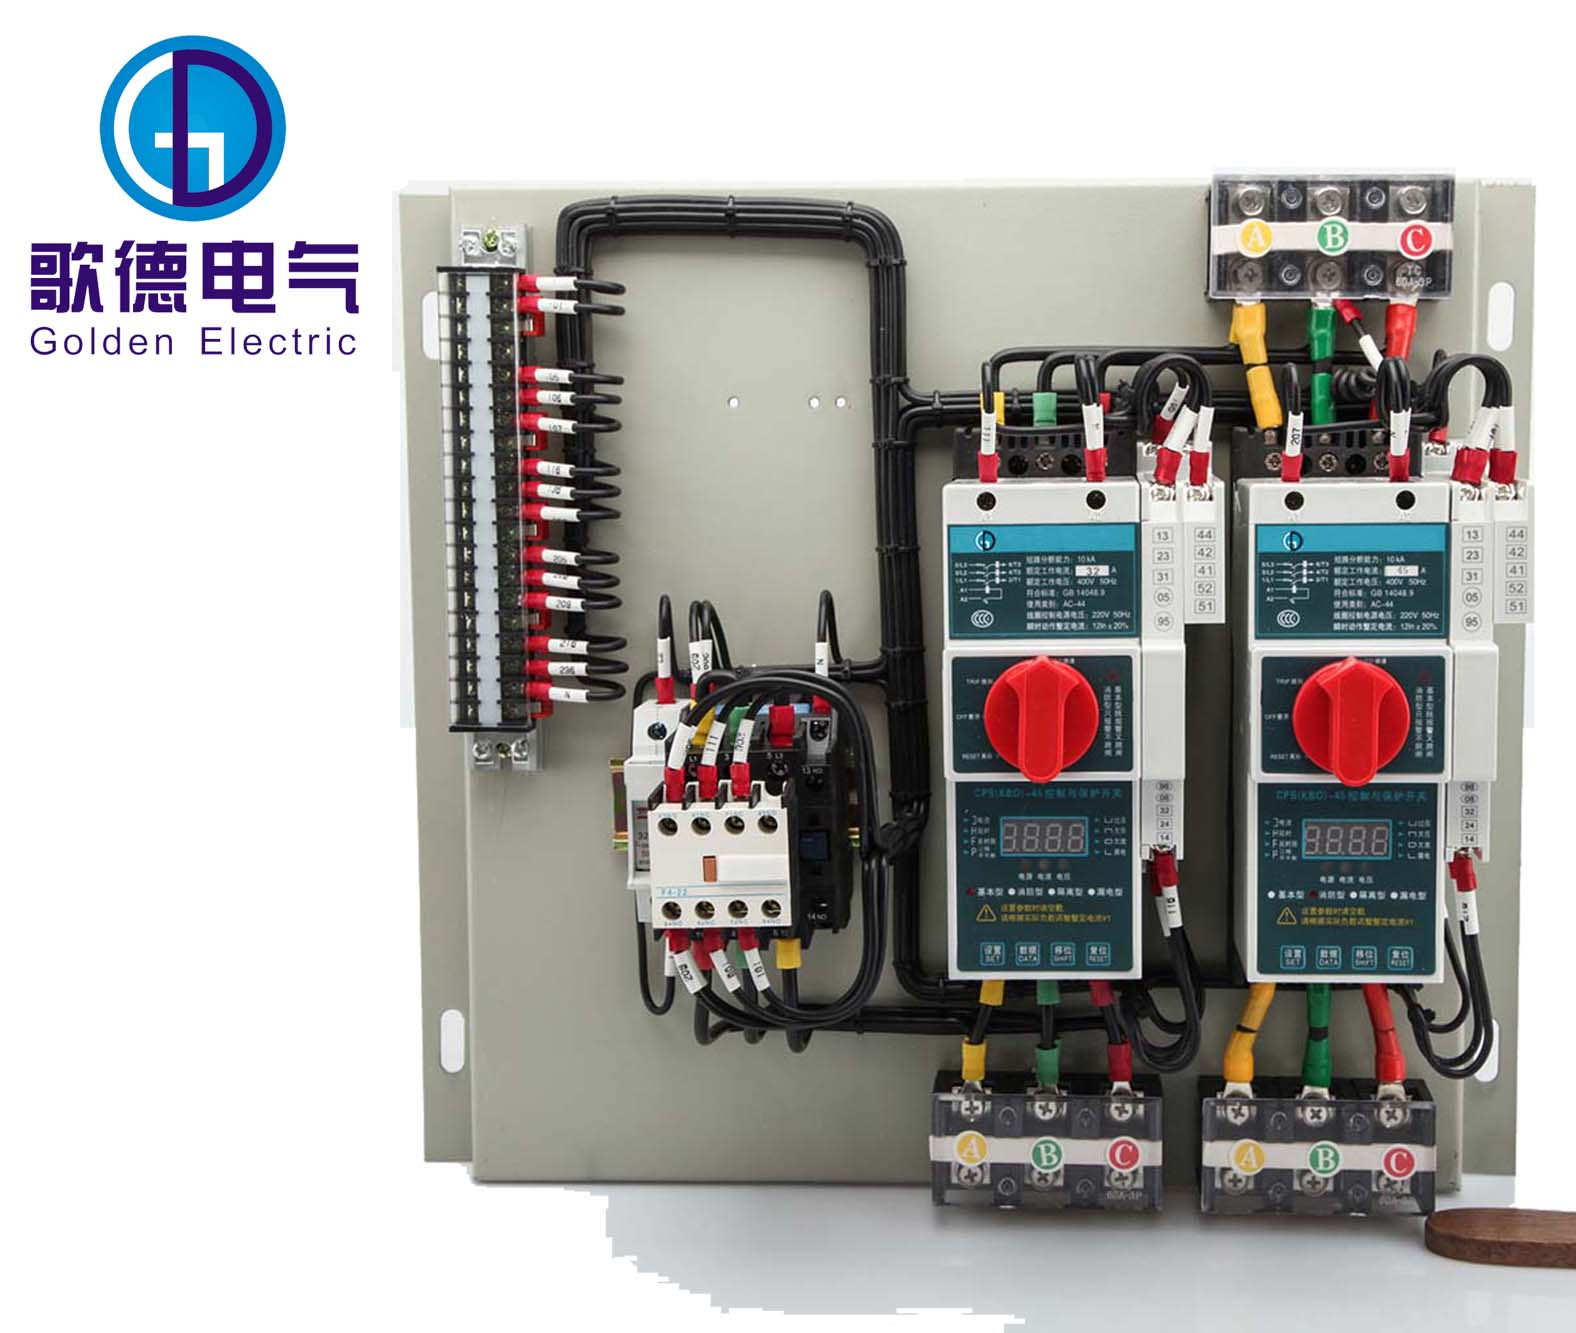 电路板 1576_1333